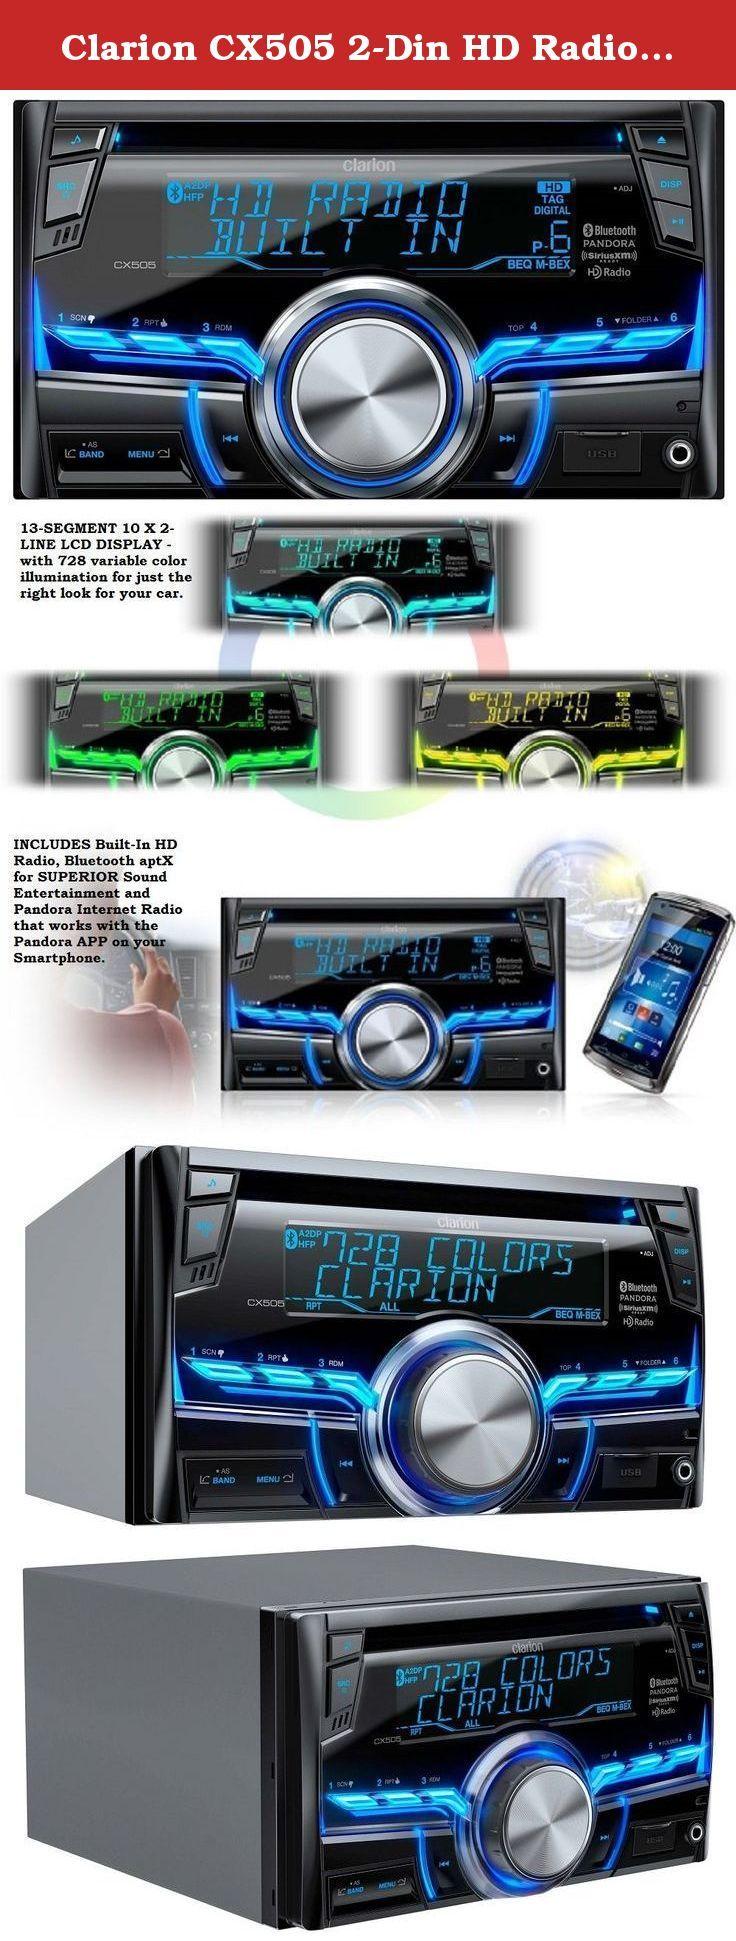 Clarion CX505 2-Din HD Radio/Bluetooth/CD/USB/MP3/WMA Recei